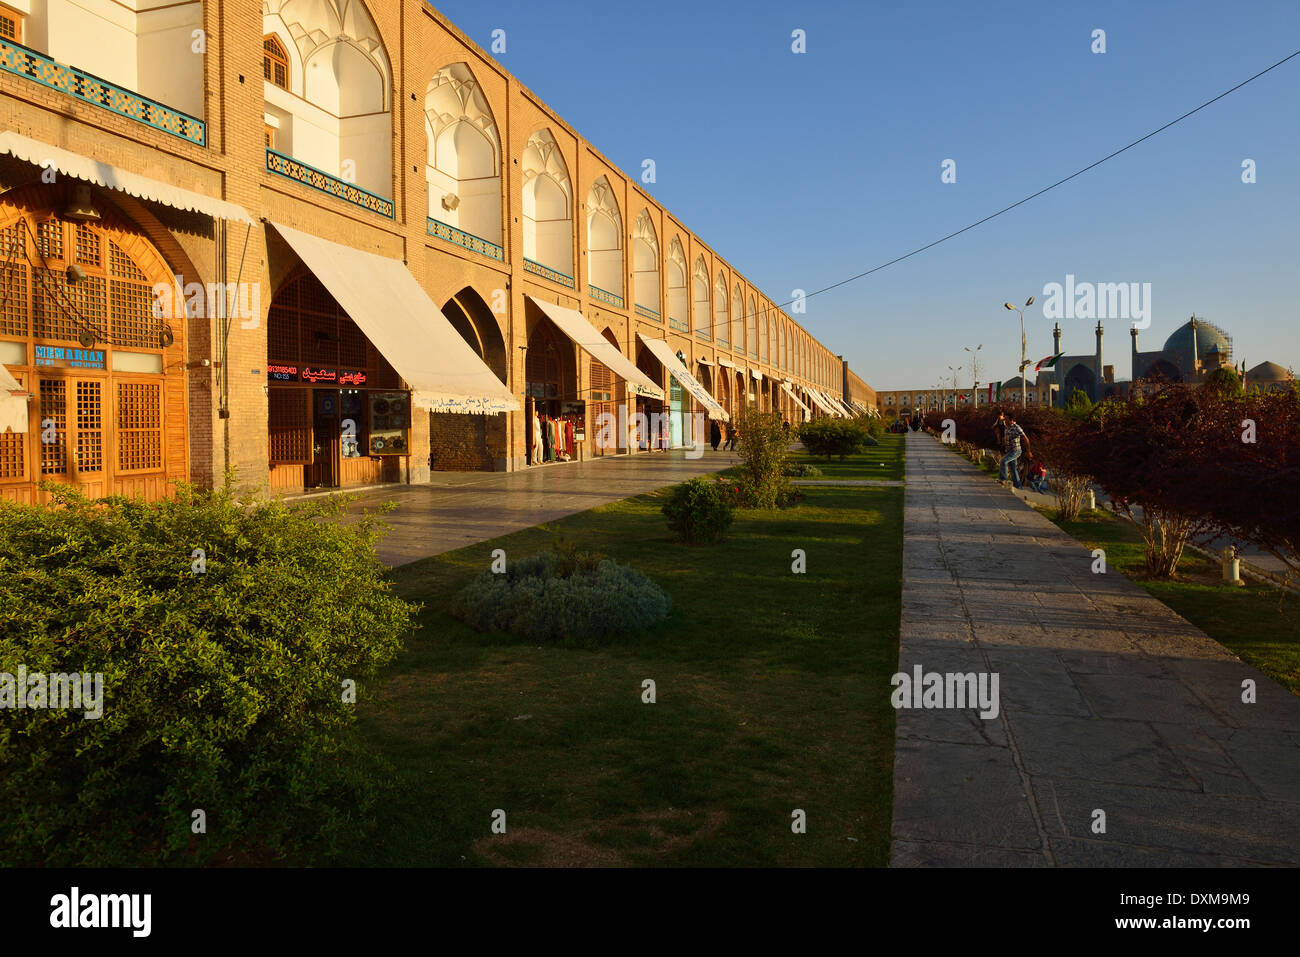 Iran, Isfahan, Meidan-e Emam, Naqsh-e Jahan, Imam Square - Stock Image